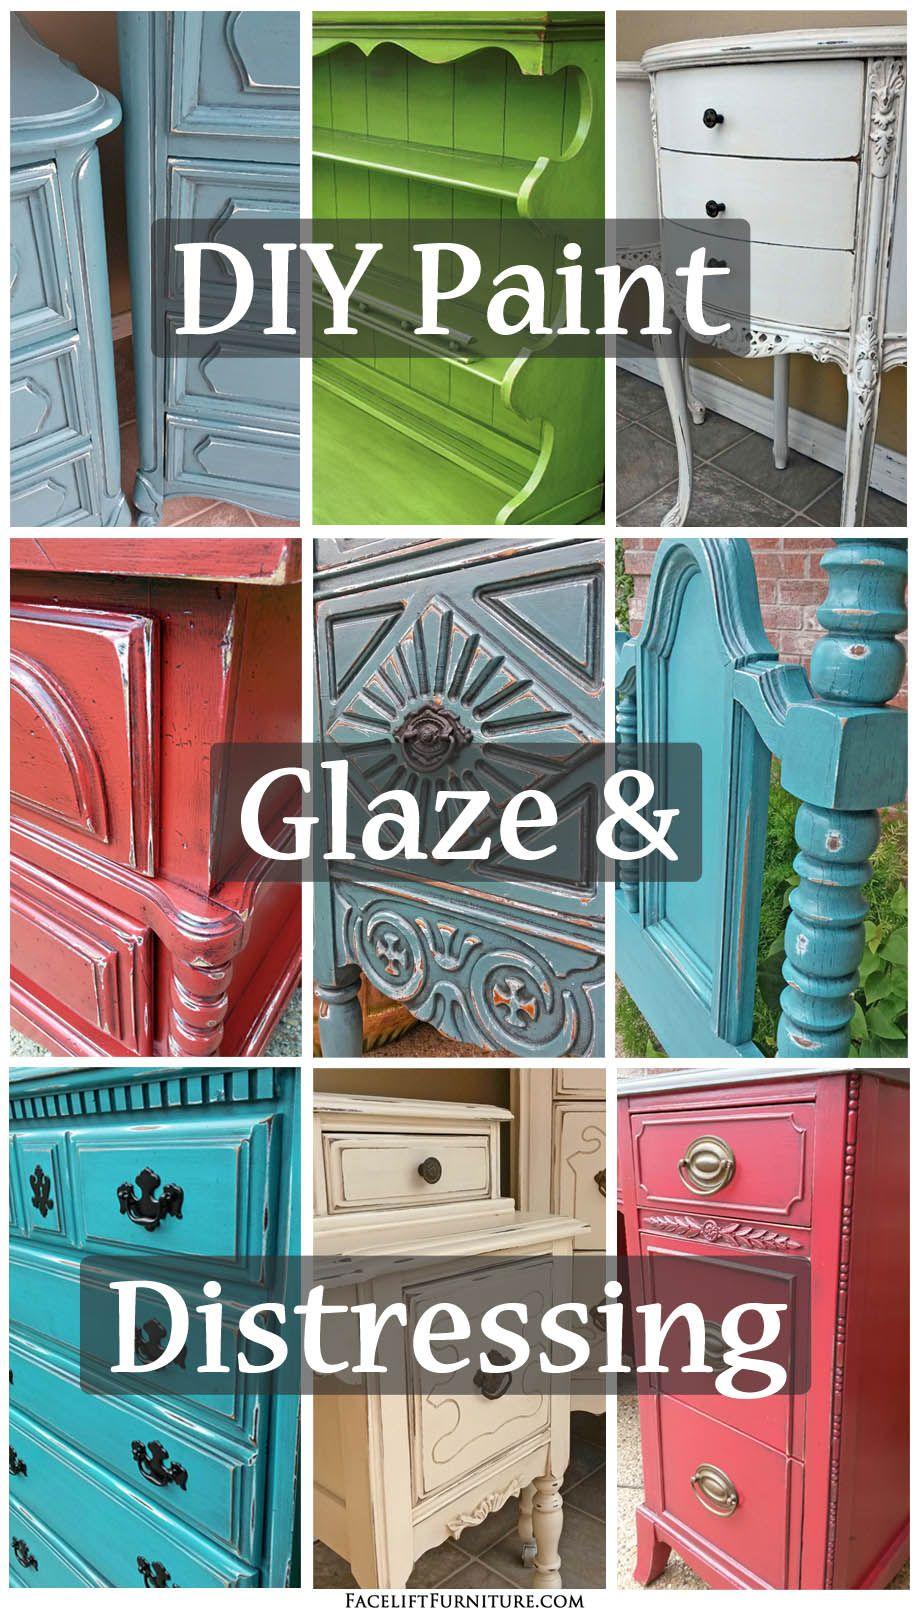 DIY Paint, Glaze & Distressing - Facelift Furniture